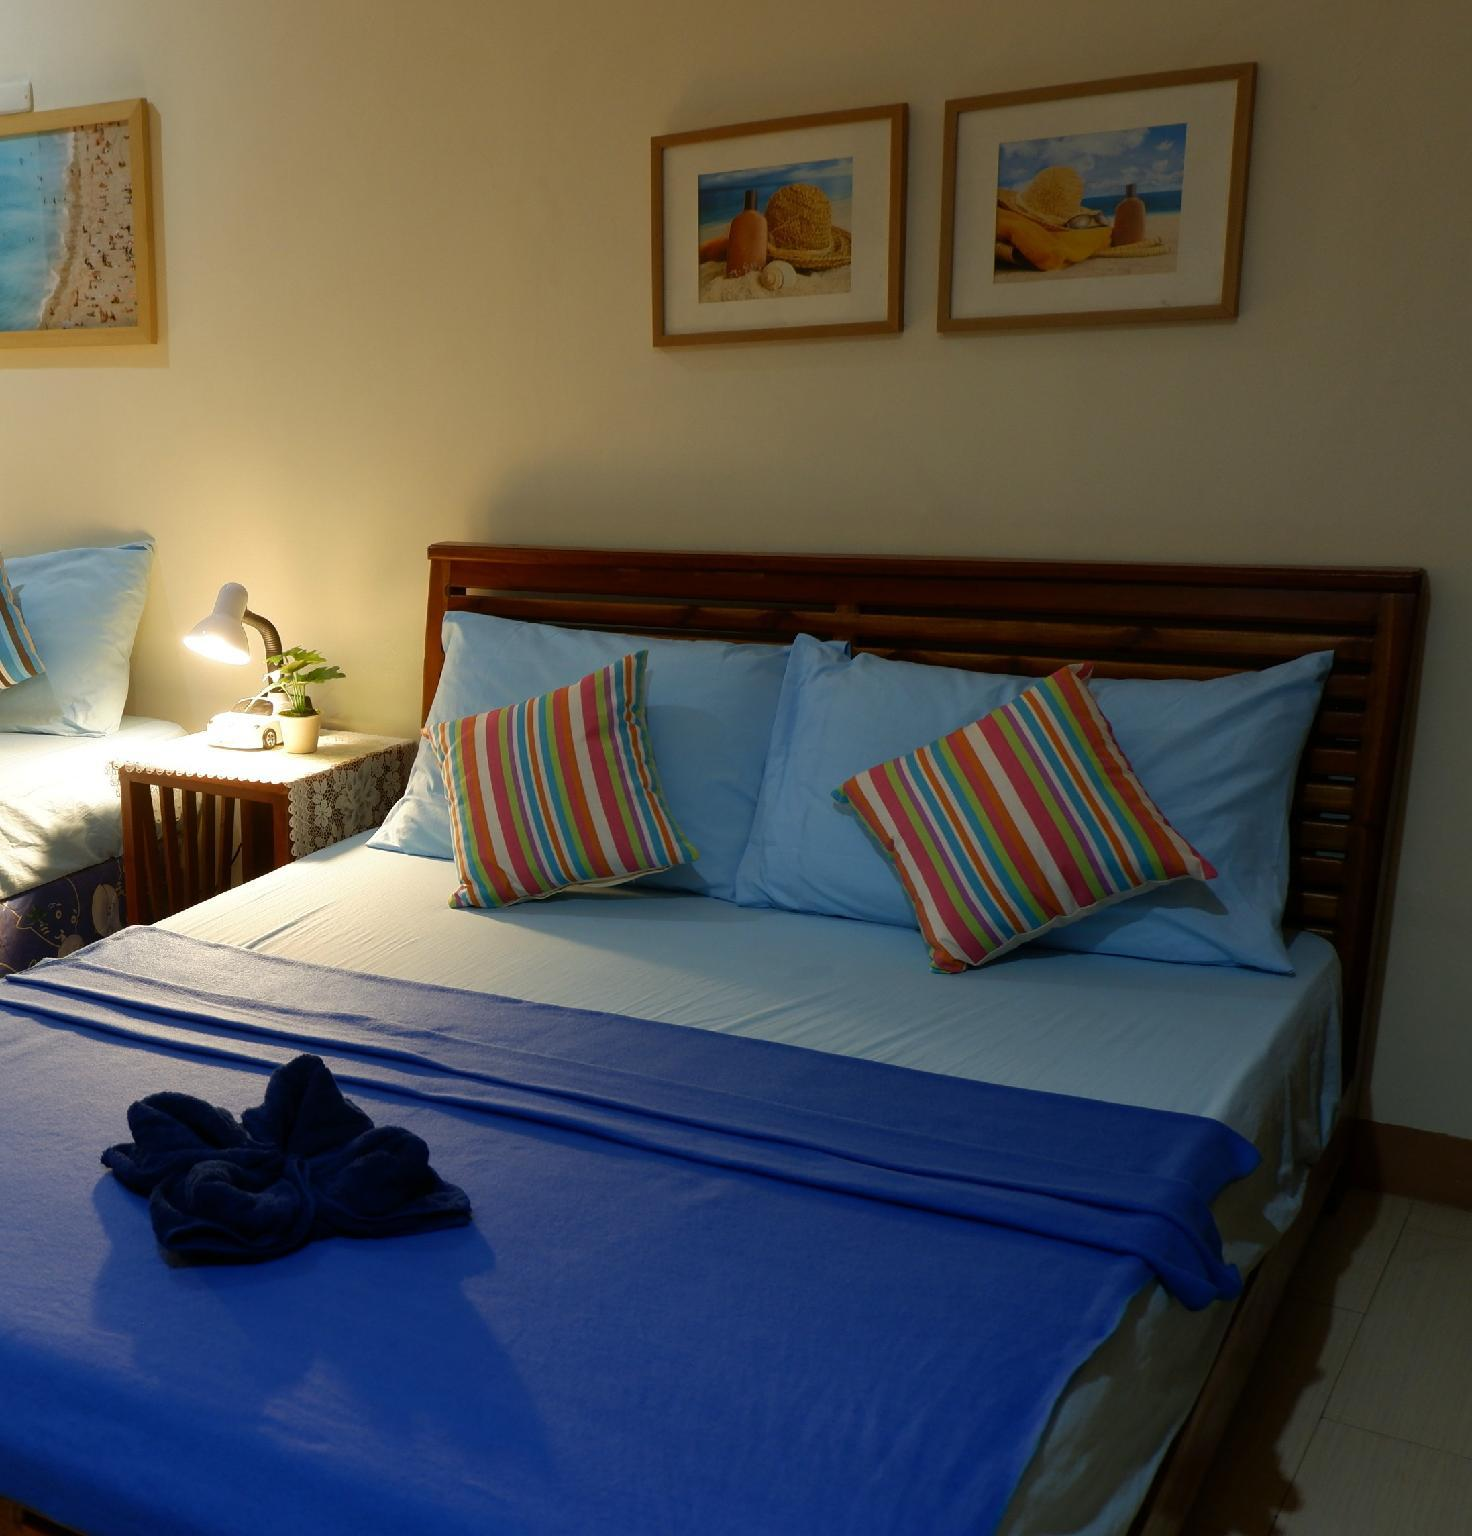 Best Price on Cebu Budget Hotel City Center in Cebu Reviews